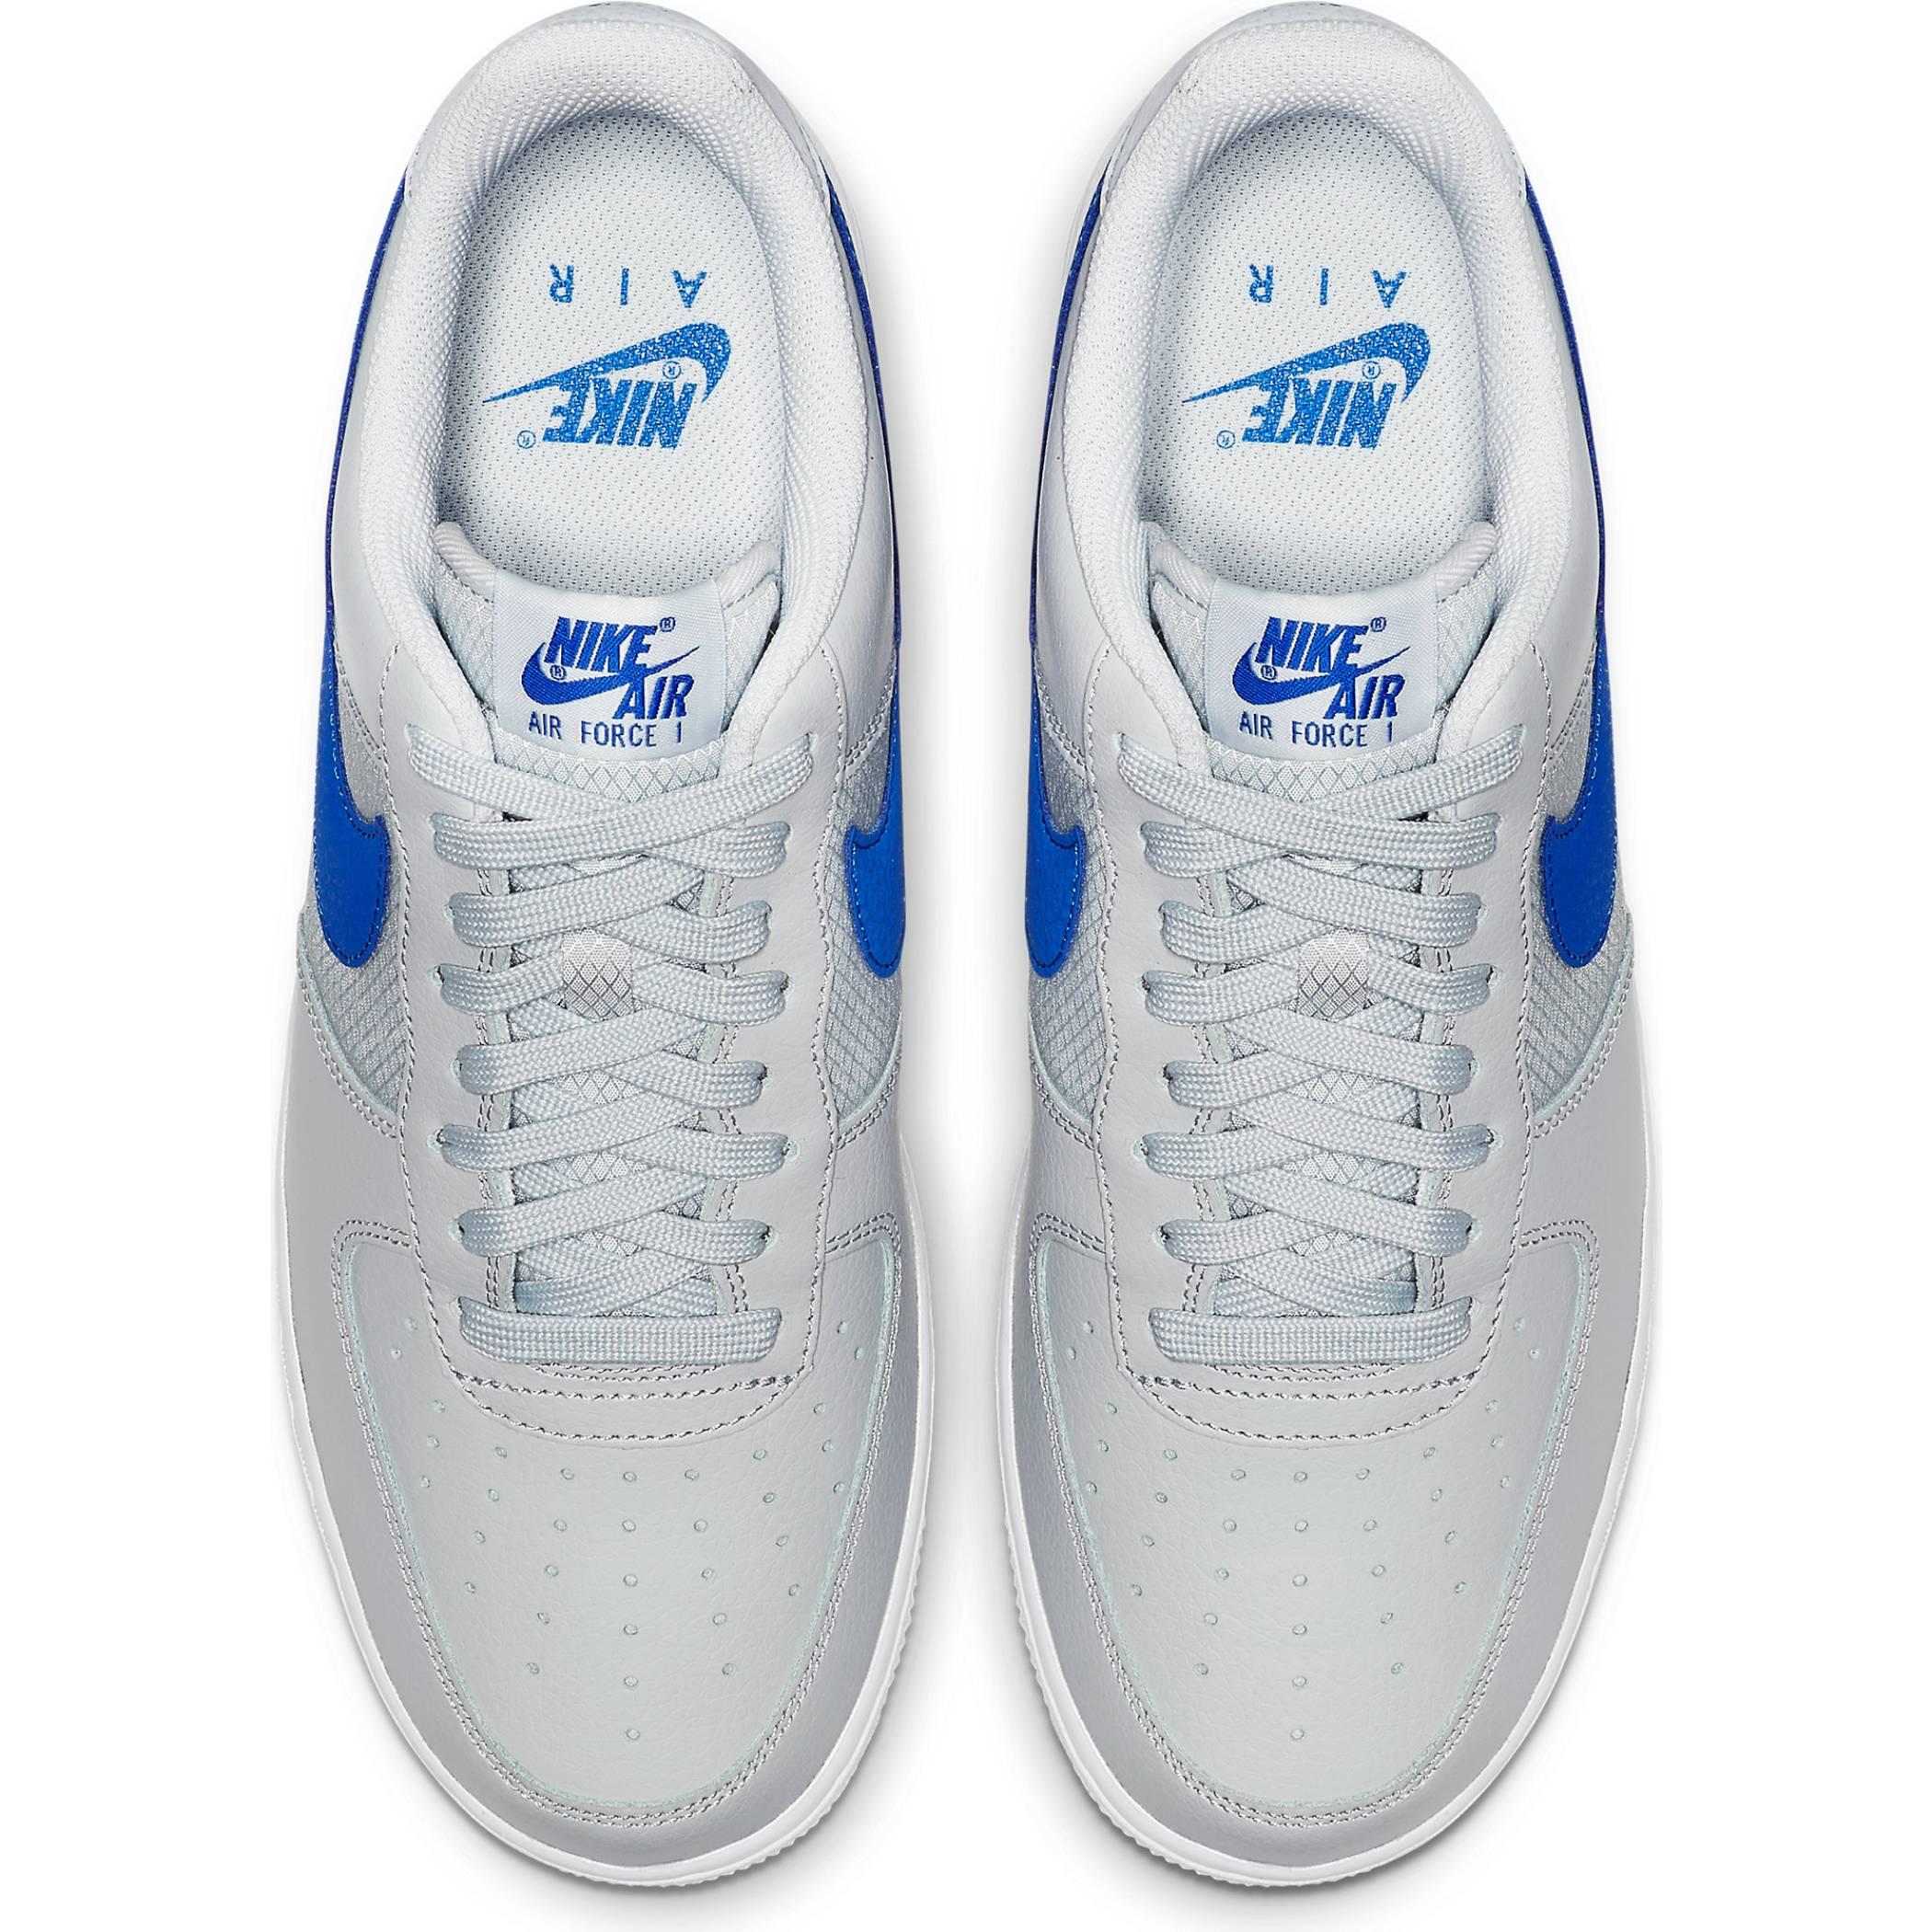 11cf1f76 Мужские кроссовки Nike Air Force 1 '07 LV8 Pure Platinum/Racer Blue - фото